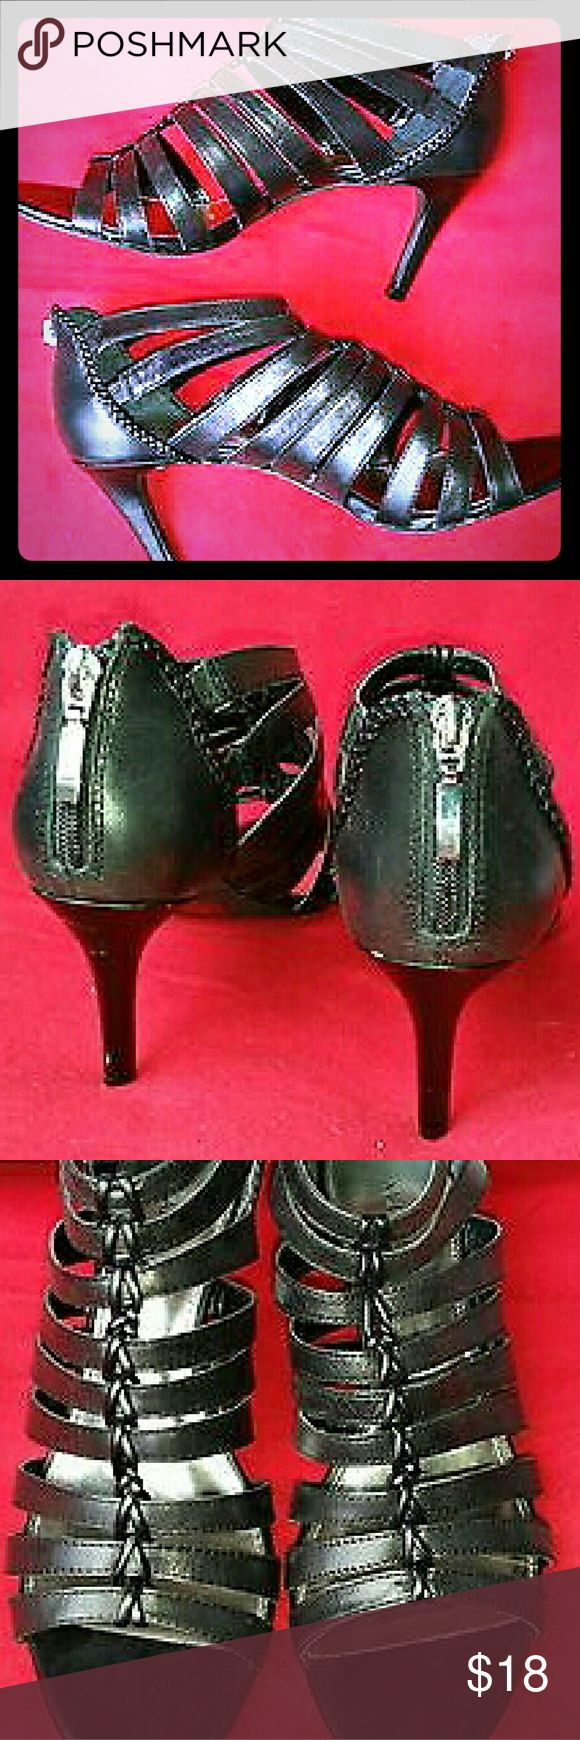 Alfani Black Menny Open Toe Sandals Open toe synthetic sandals, never been worn, still in original box Alfani Shoes Sandals